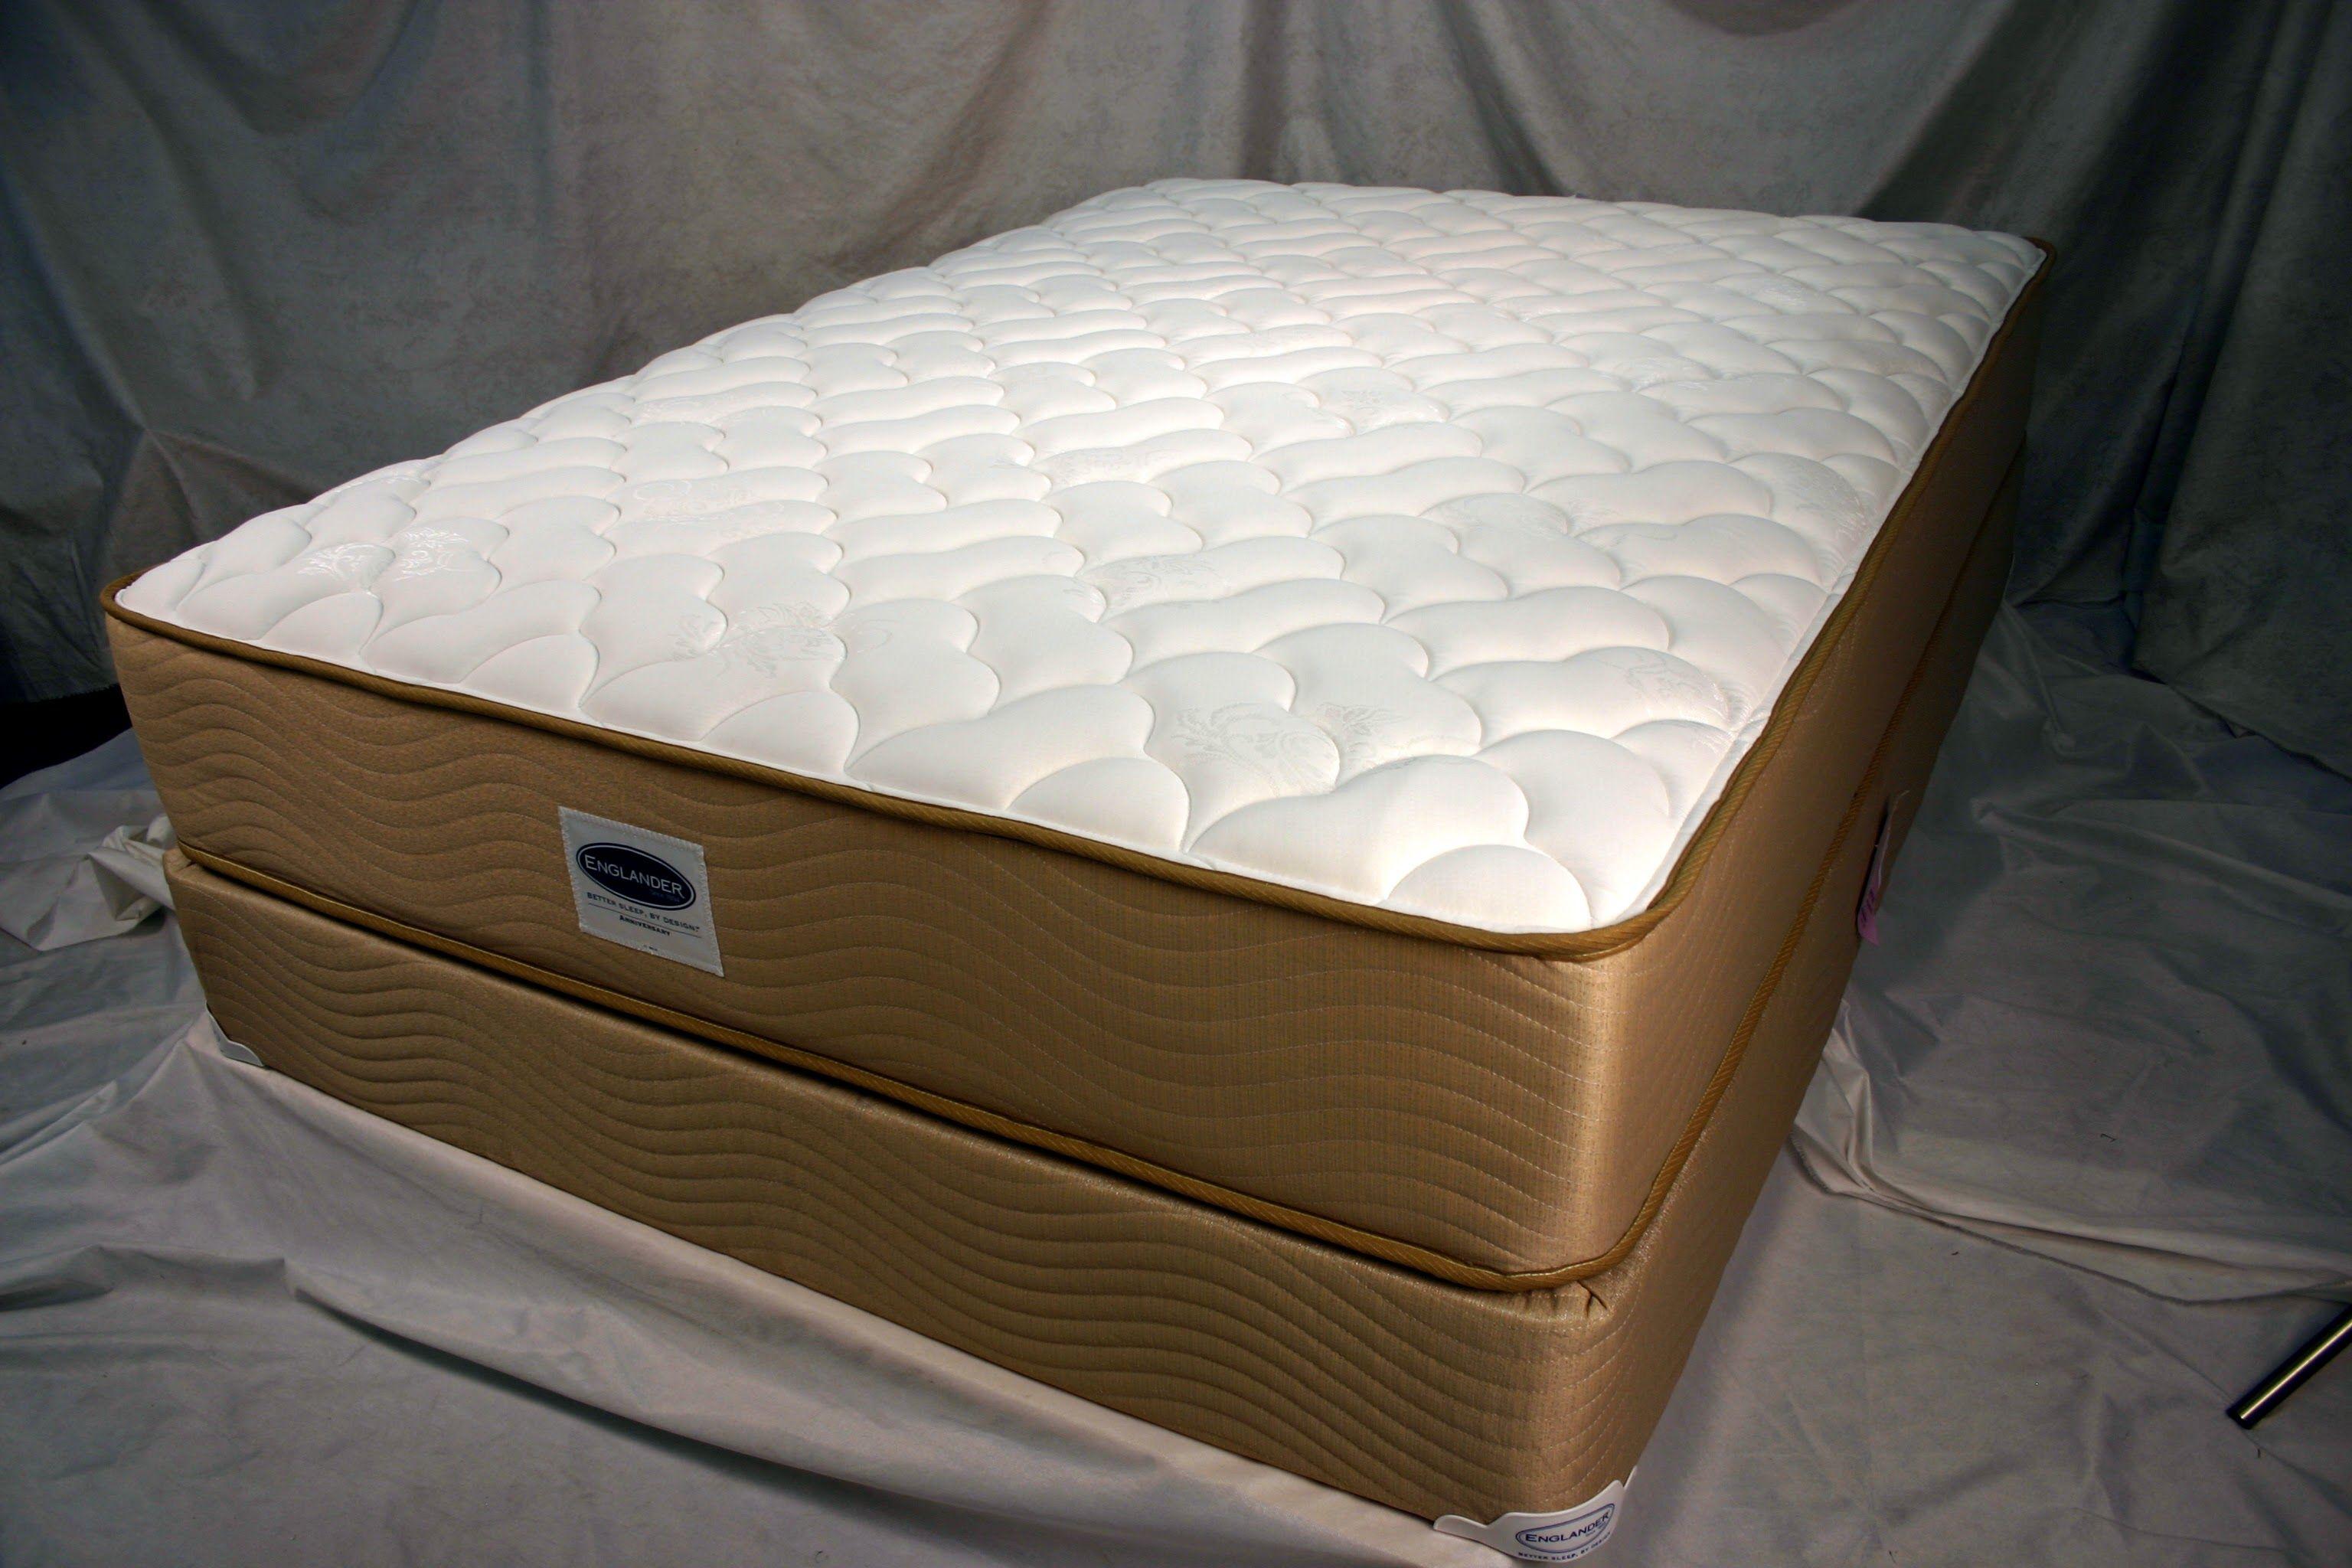 for news mattresses f san and com sue antonio aol less gmail ex bob view flyerboard express mattress furniture